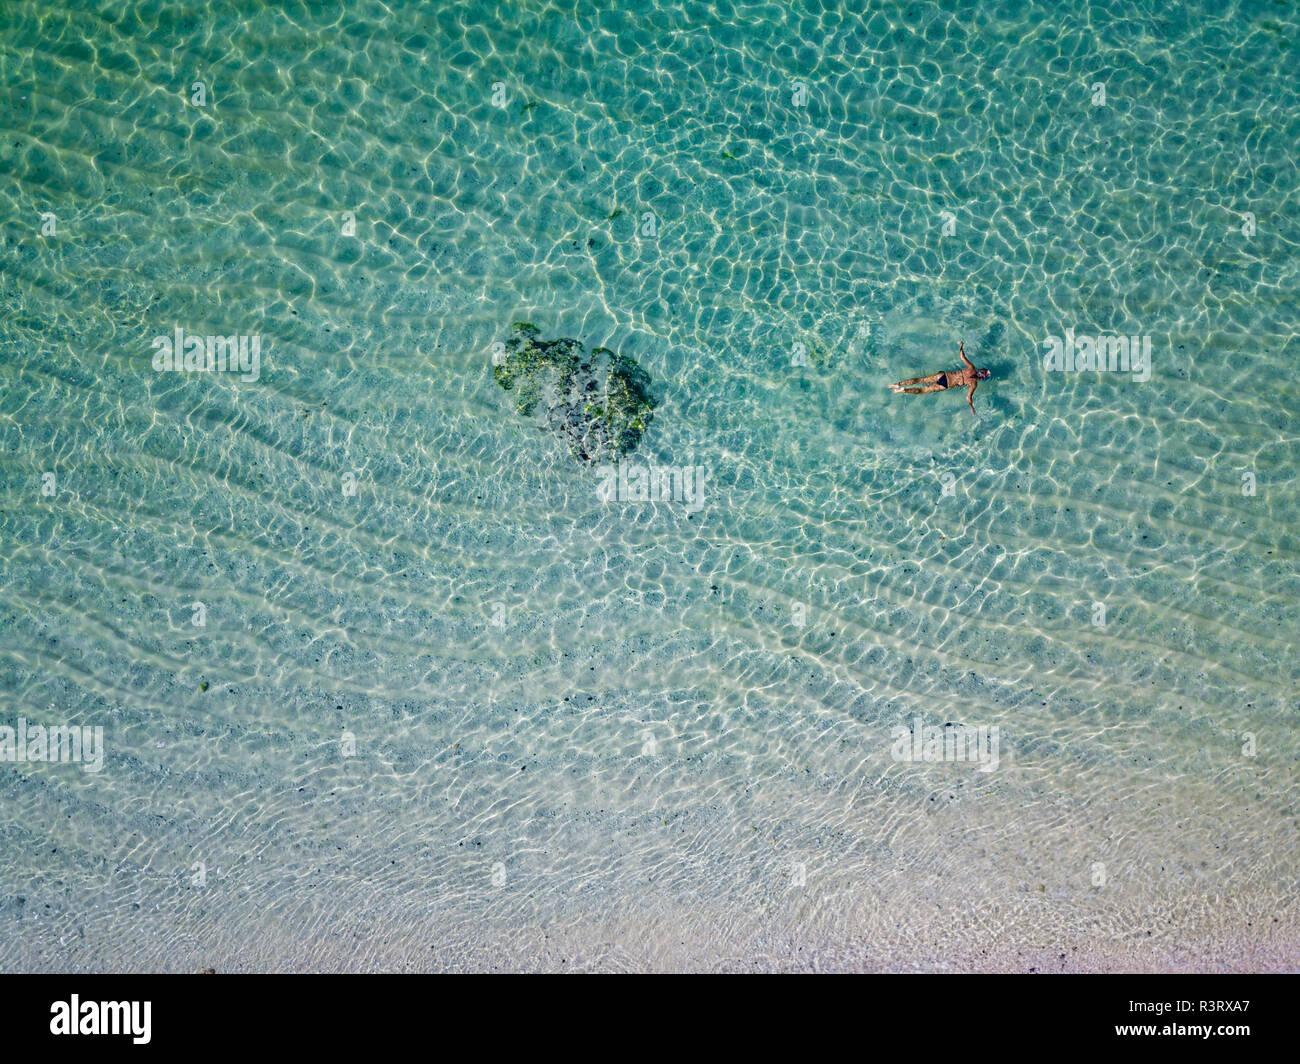 Indonesia, Bali, Melasti, vista aerea del Karma Kandara beach, uomo nuoto Immagini Stock